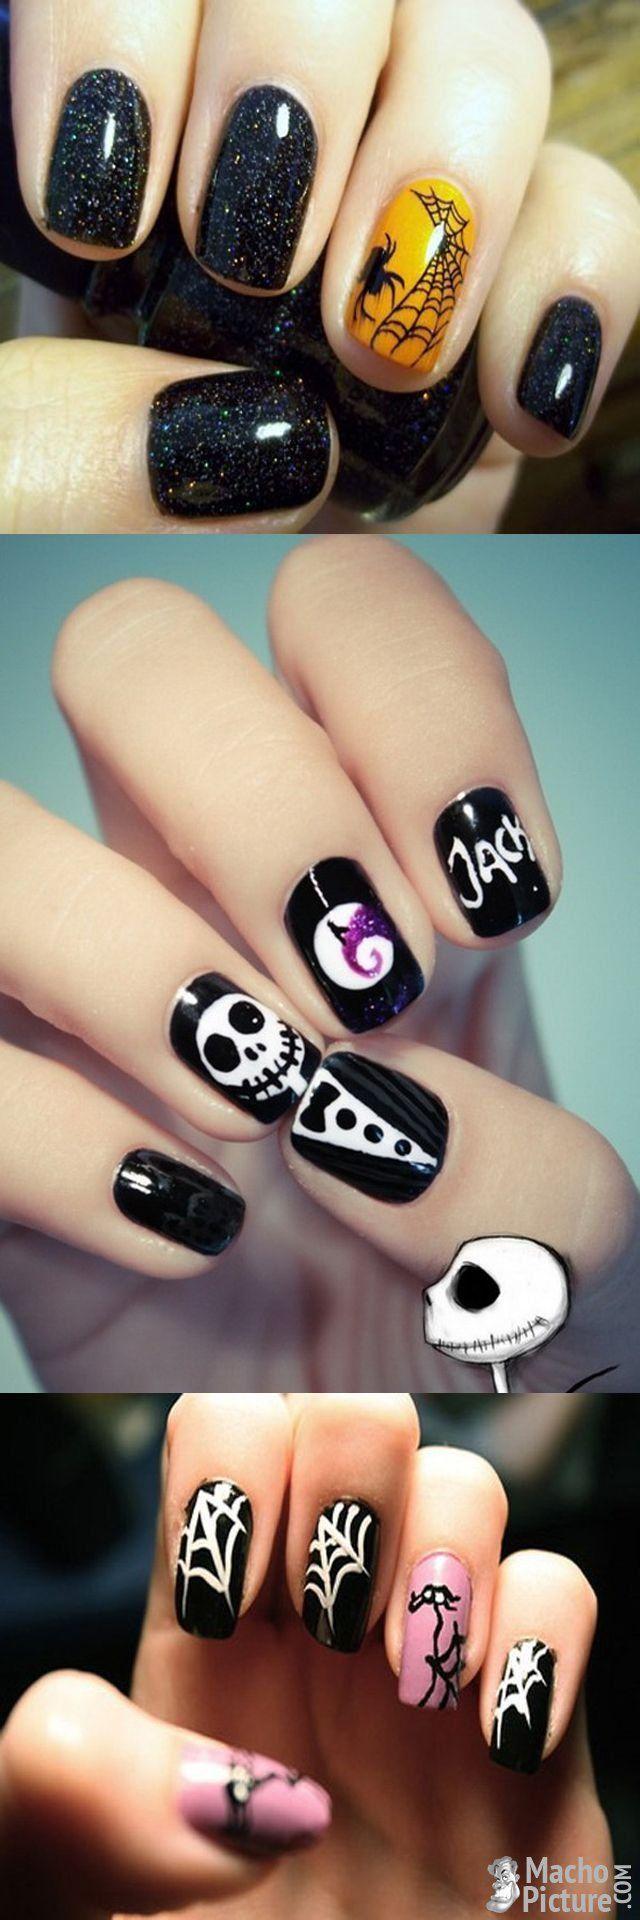 25 Best Ideas About Halloween Acrylic Nails On Pinterest